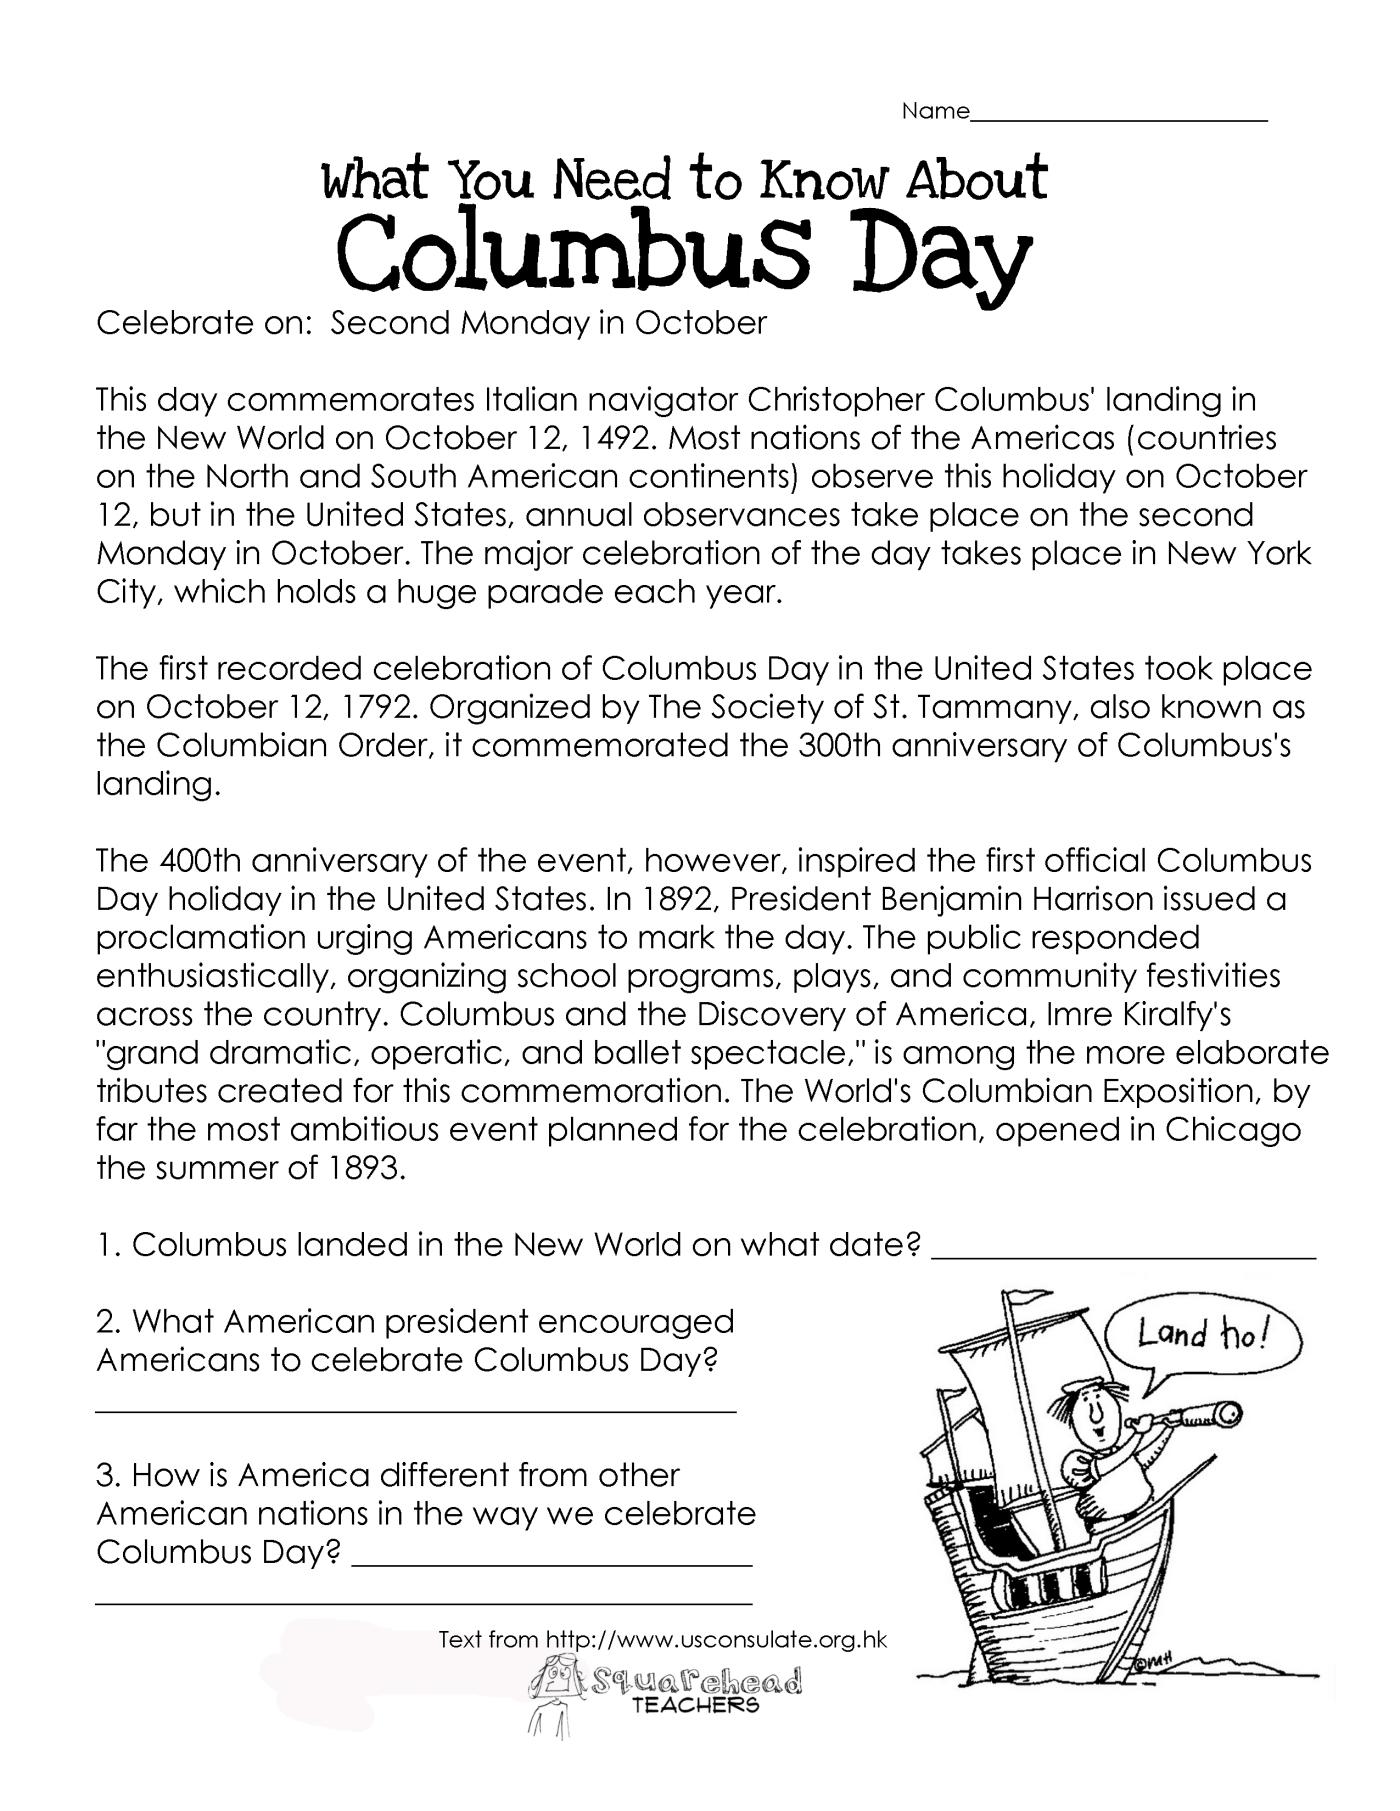 Worksheets Columbus Day Worksheets worksheet columbus day worksheets luizah and essay free squarehead teachers